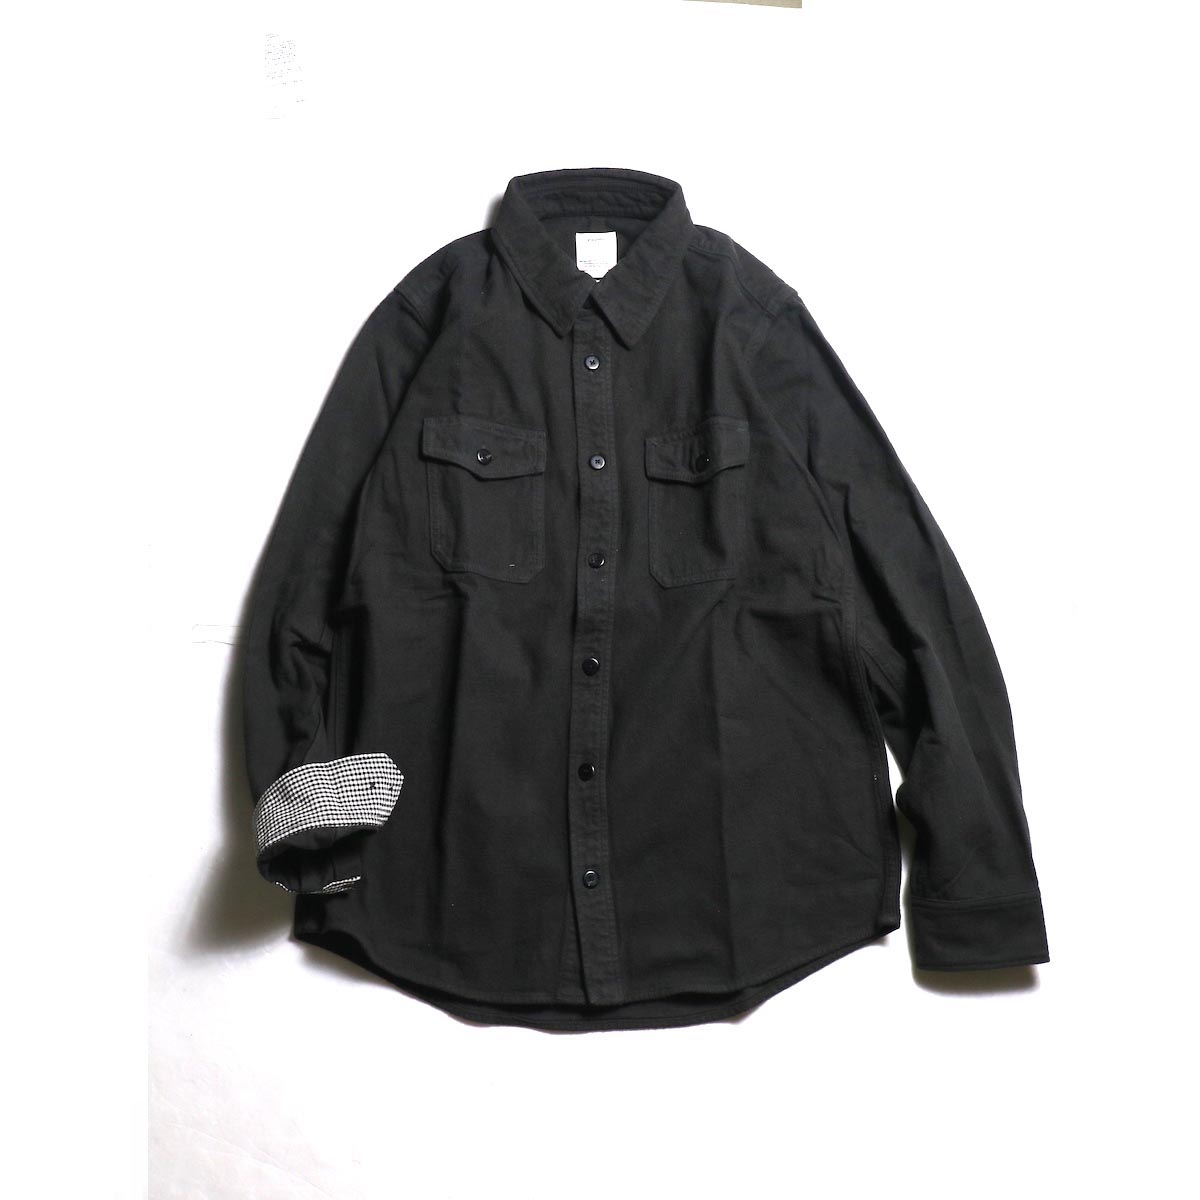 visvim / BLACK ELK FLANNEL (Black)